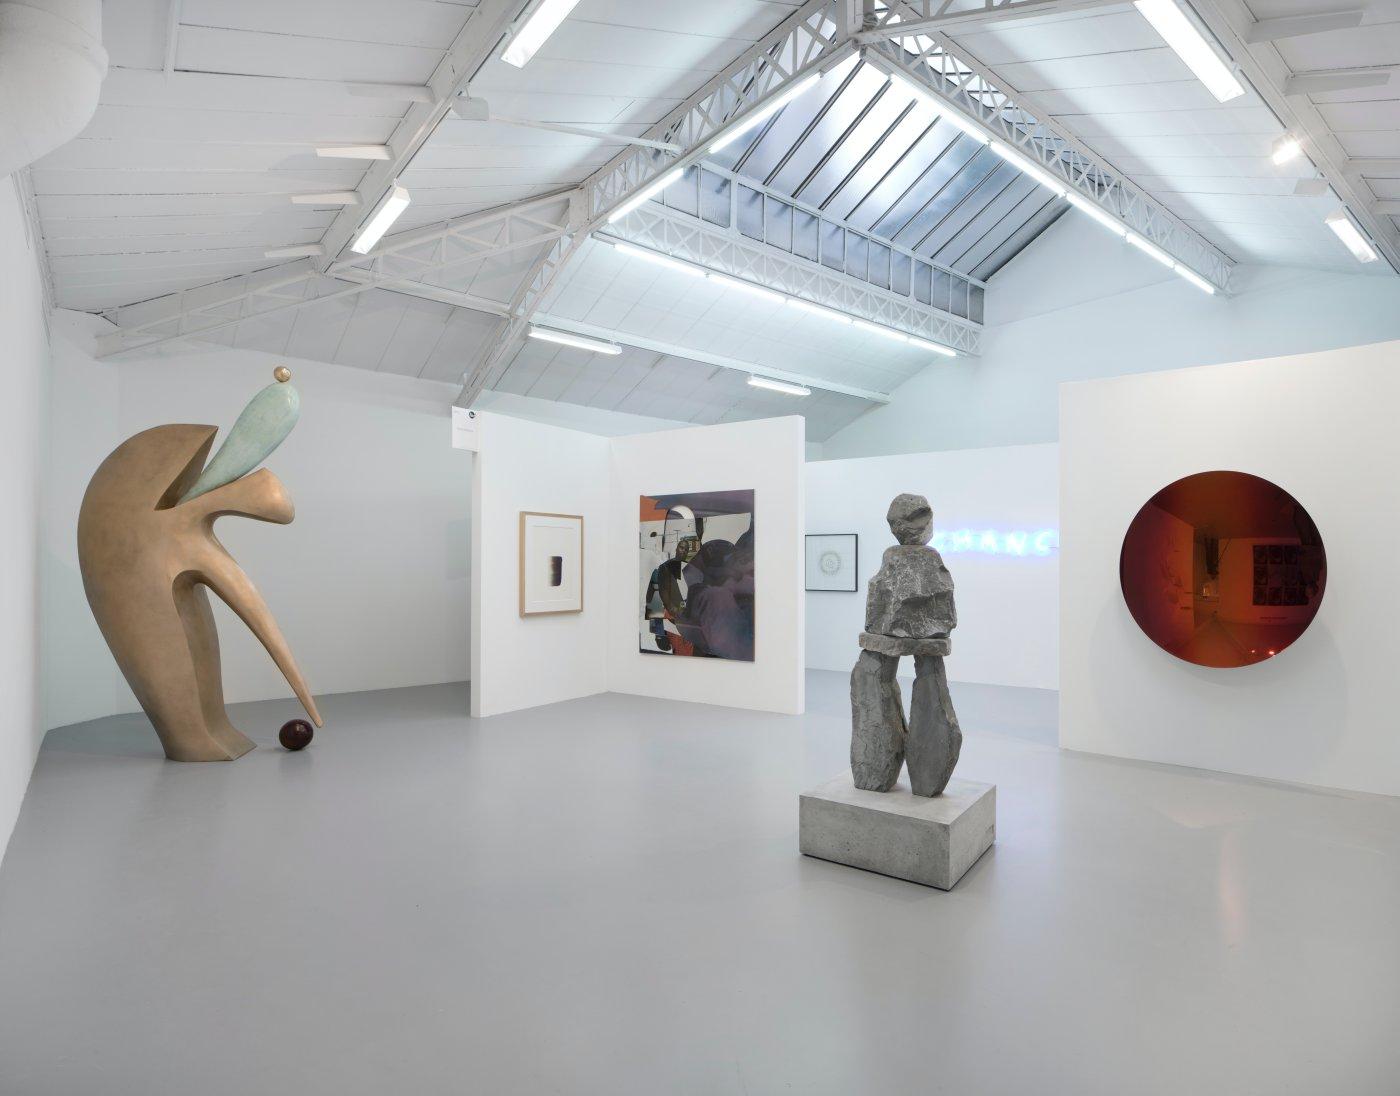 kamel mennour FIAC in the galleries 3